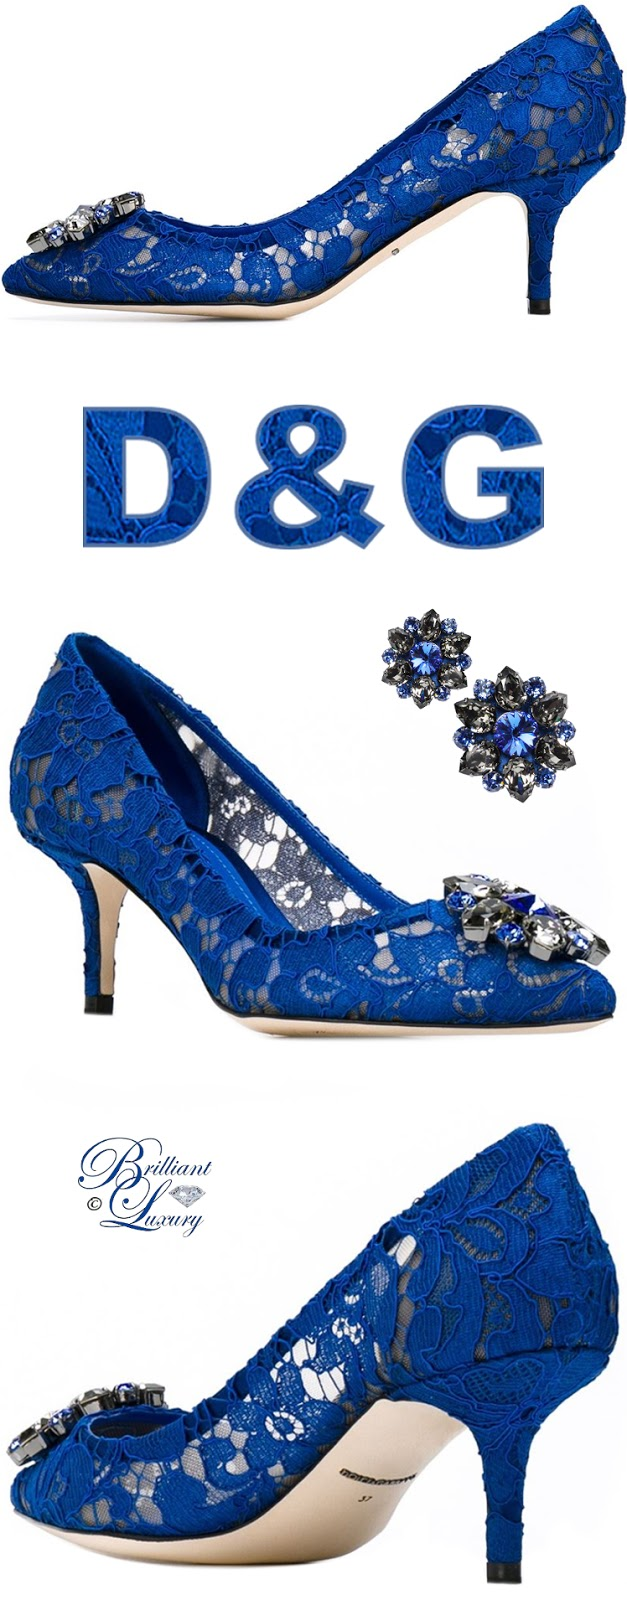 Brilliant Luxury ♦ Dolce & Gabbana Bellucci Pumps